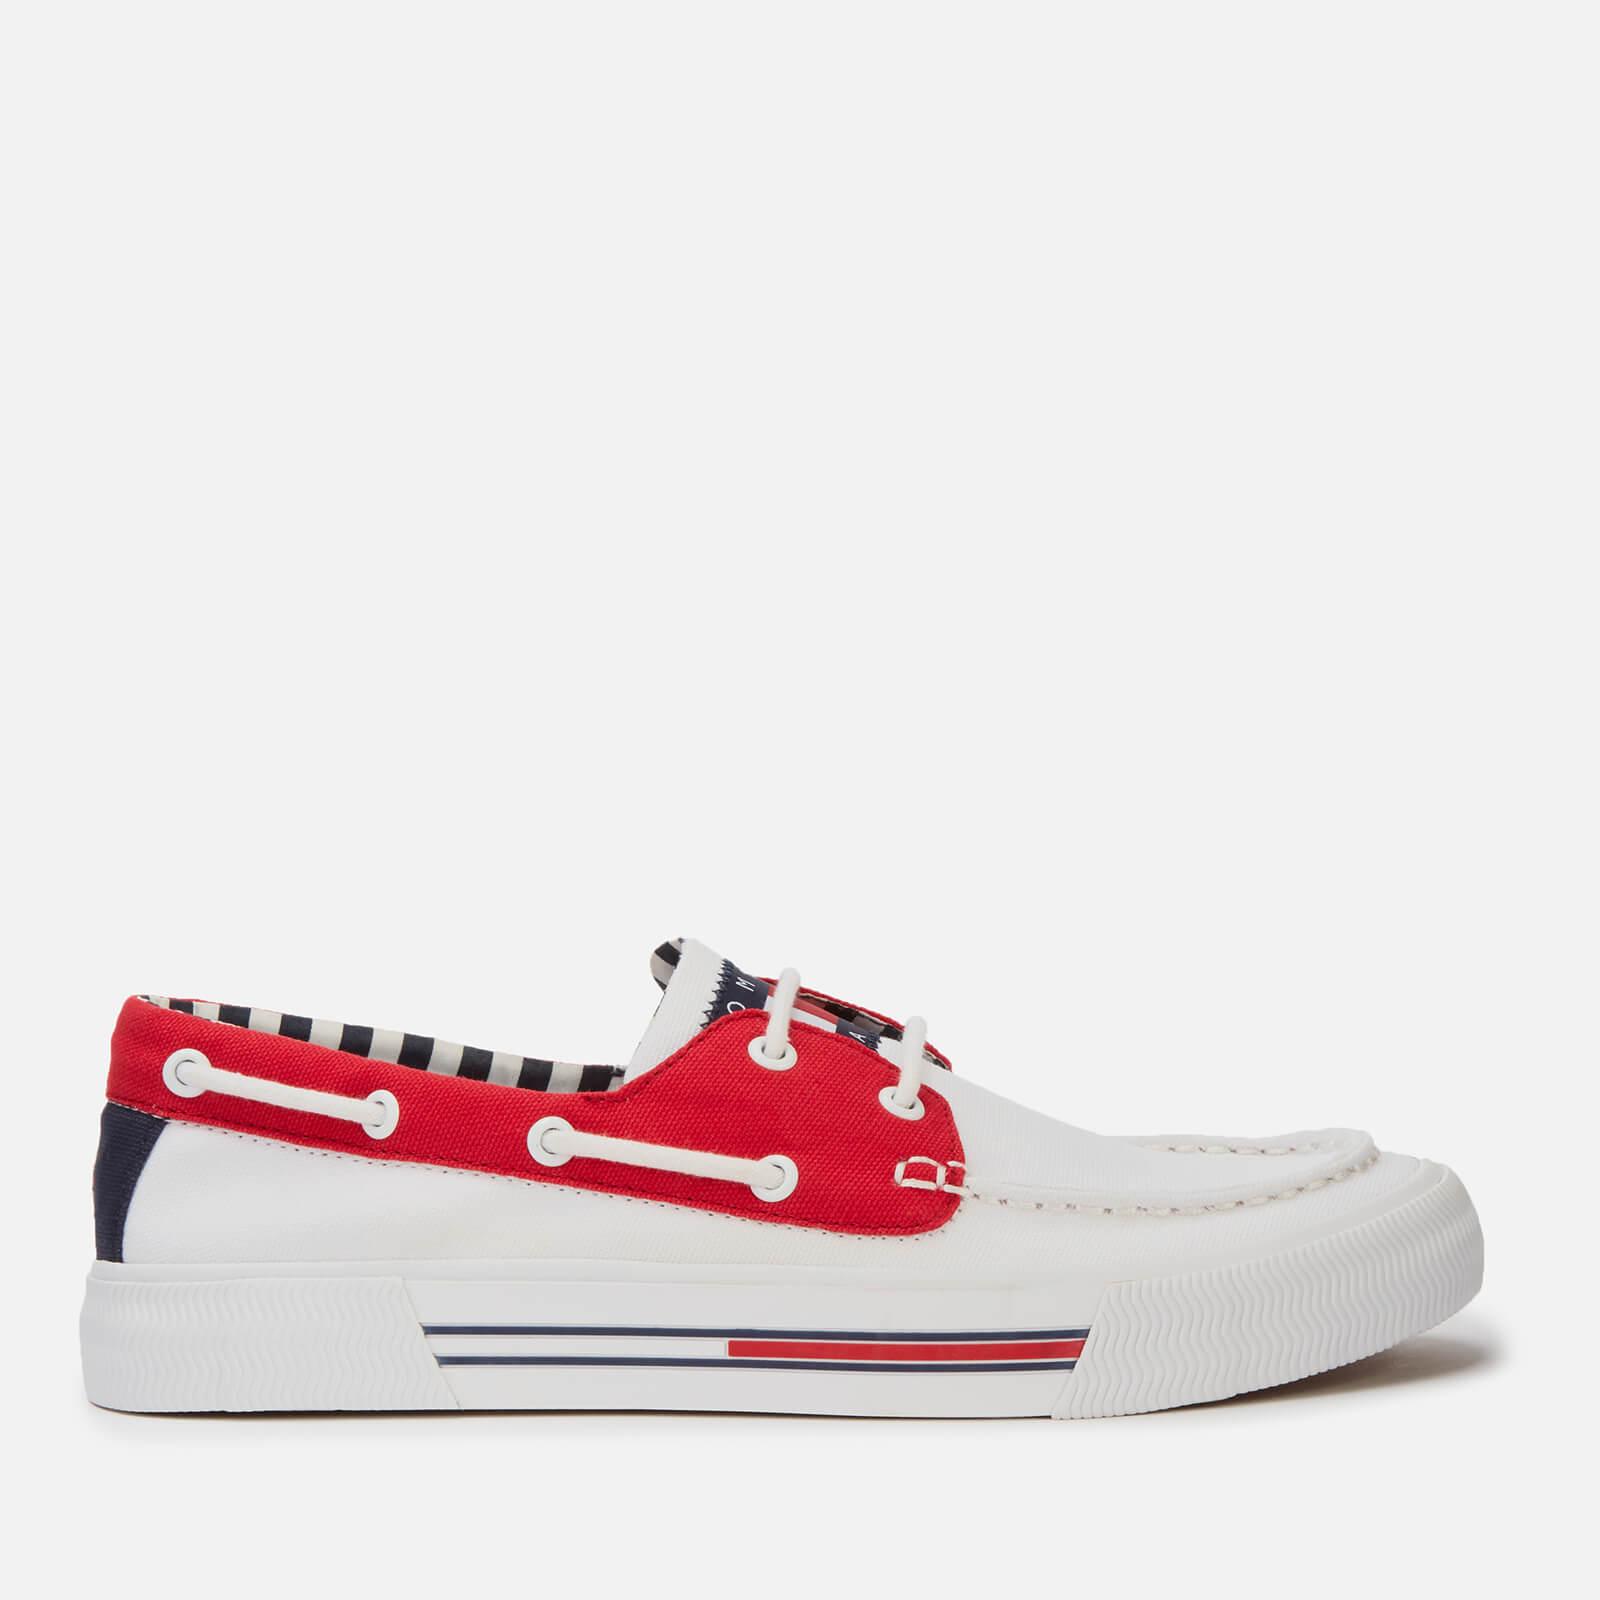 Tommy Jeans Men's Hybrid City Boat Shoes - Red/White/Black - UK 10 - White